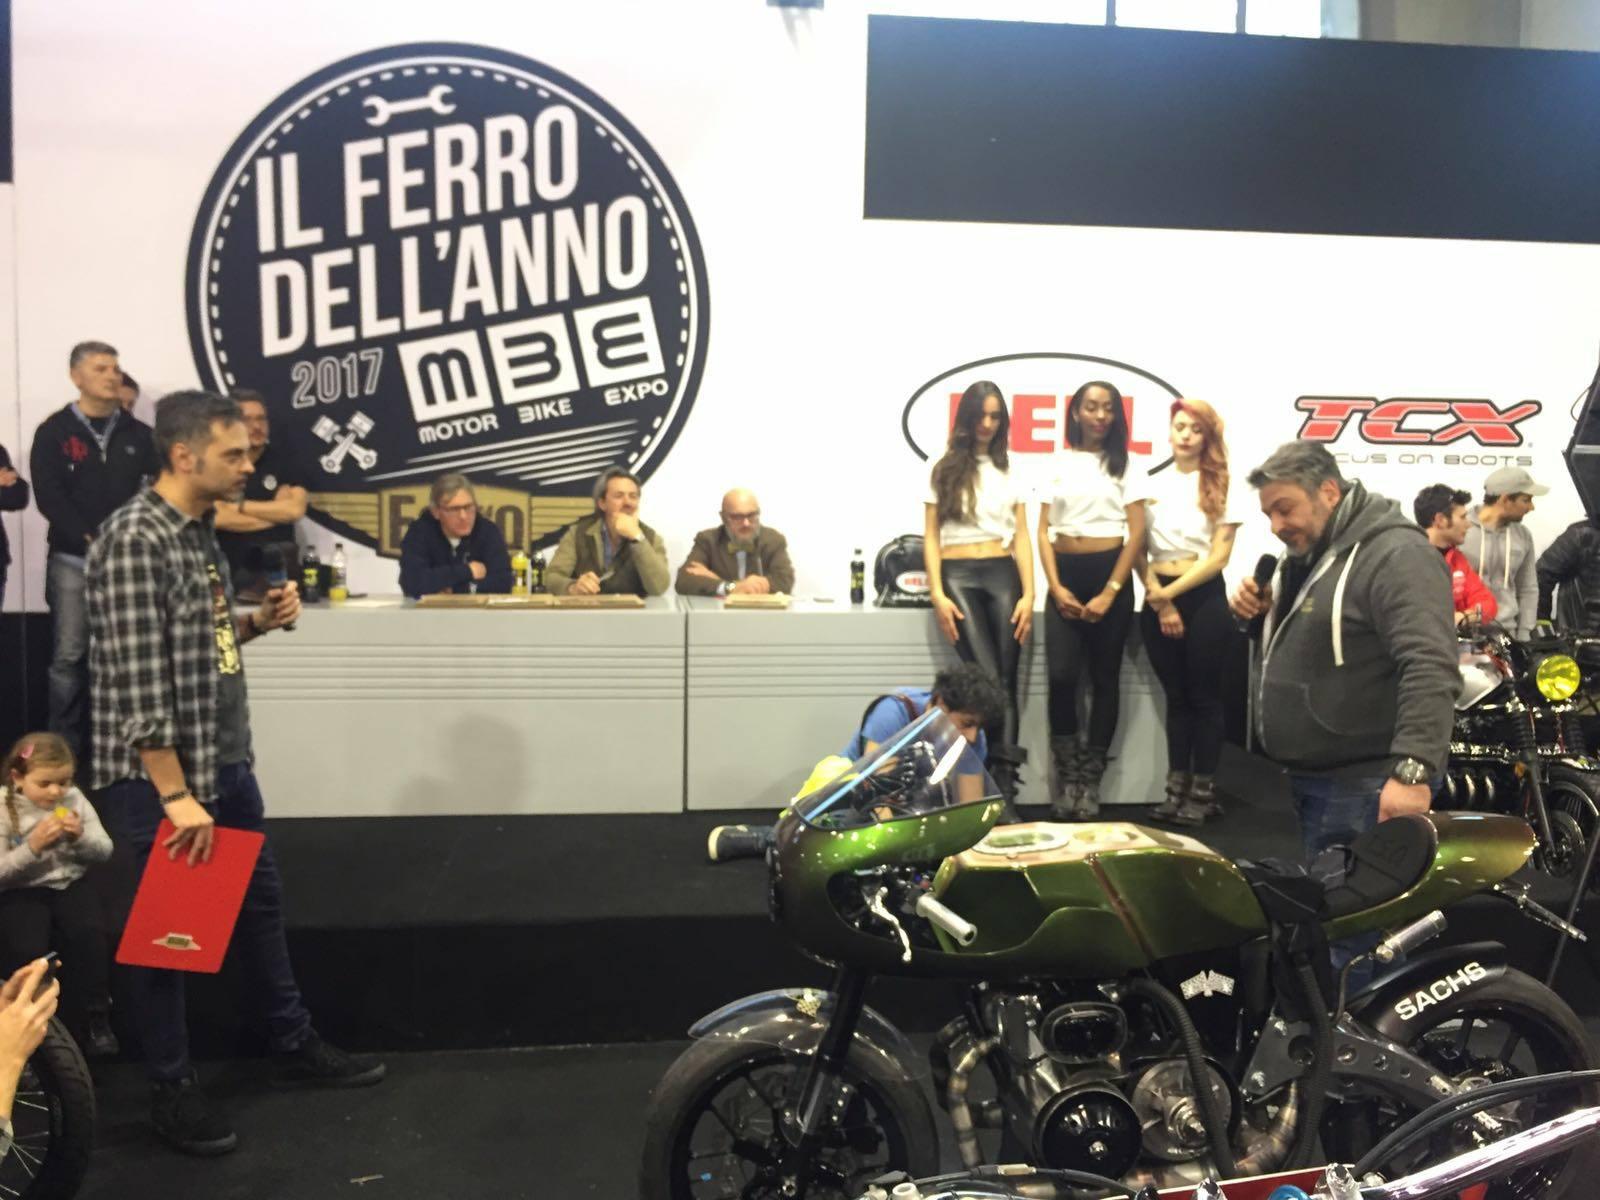 Ferro 21 Moto 2